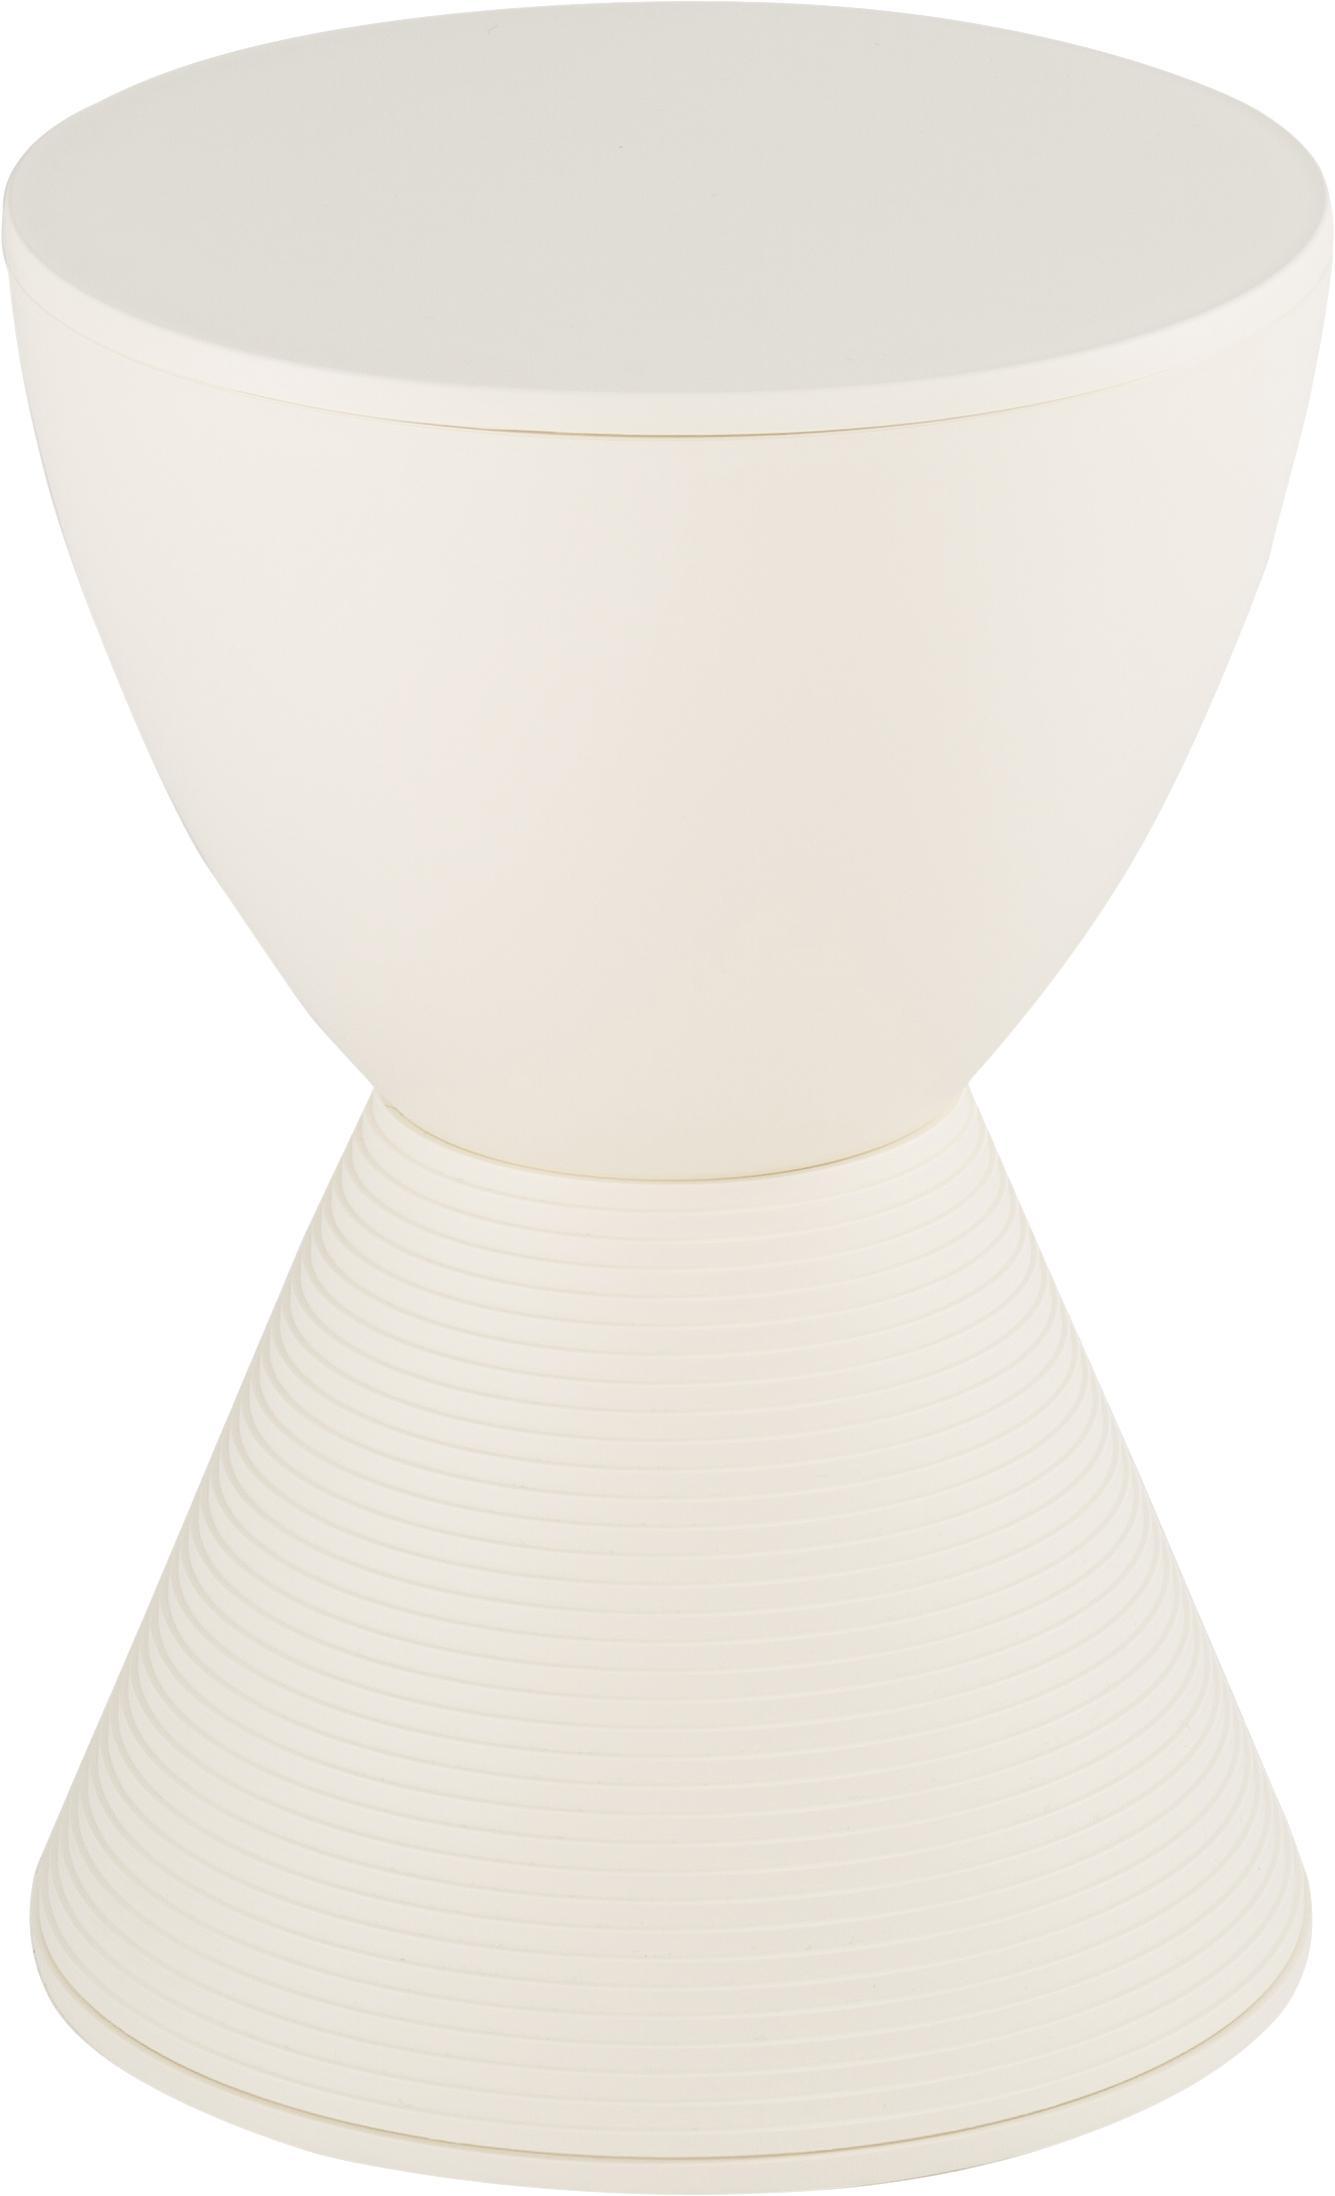 Sgabello / tavolino di design Prince AHA, Polipropilene, Cera bianca, Ø 30 x Alt. 43 cm